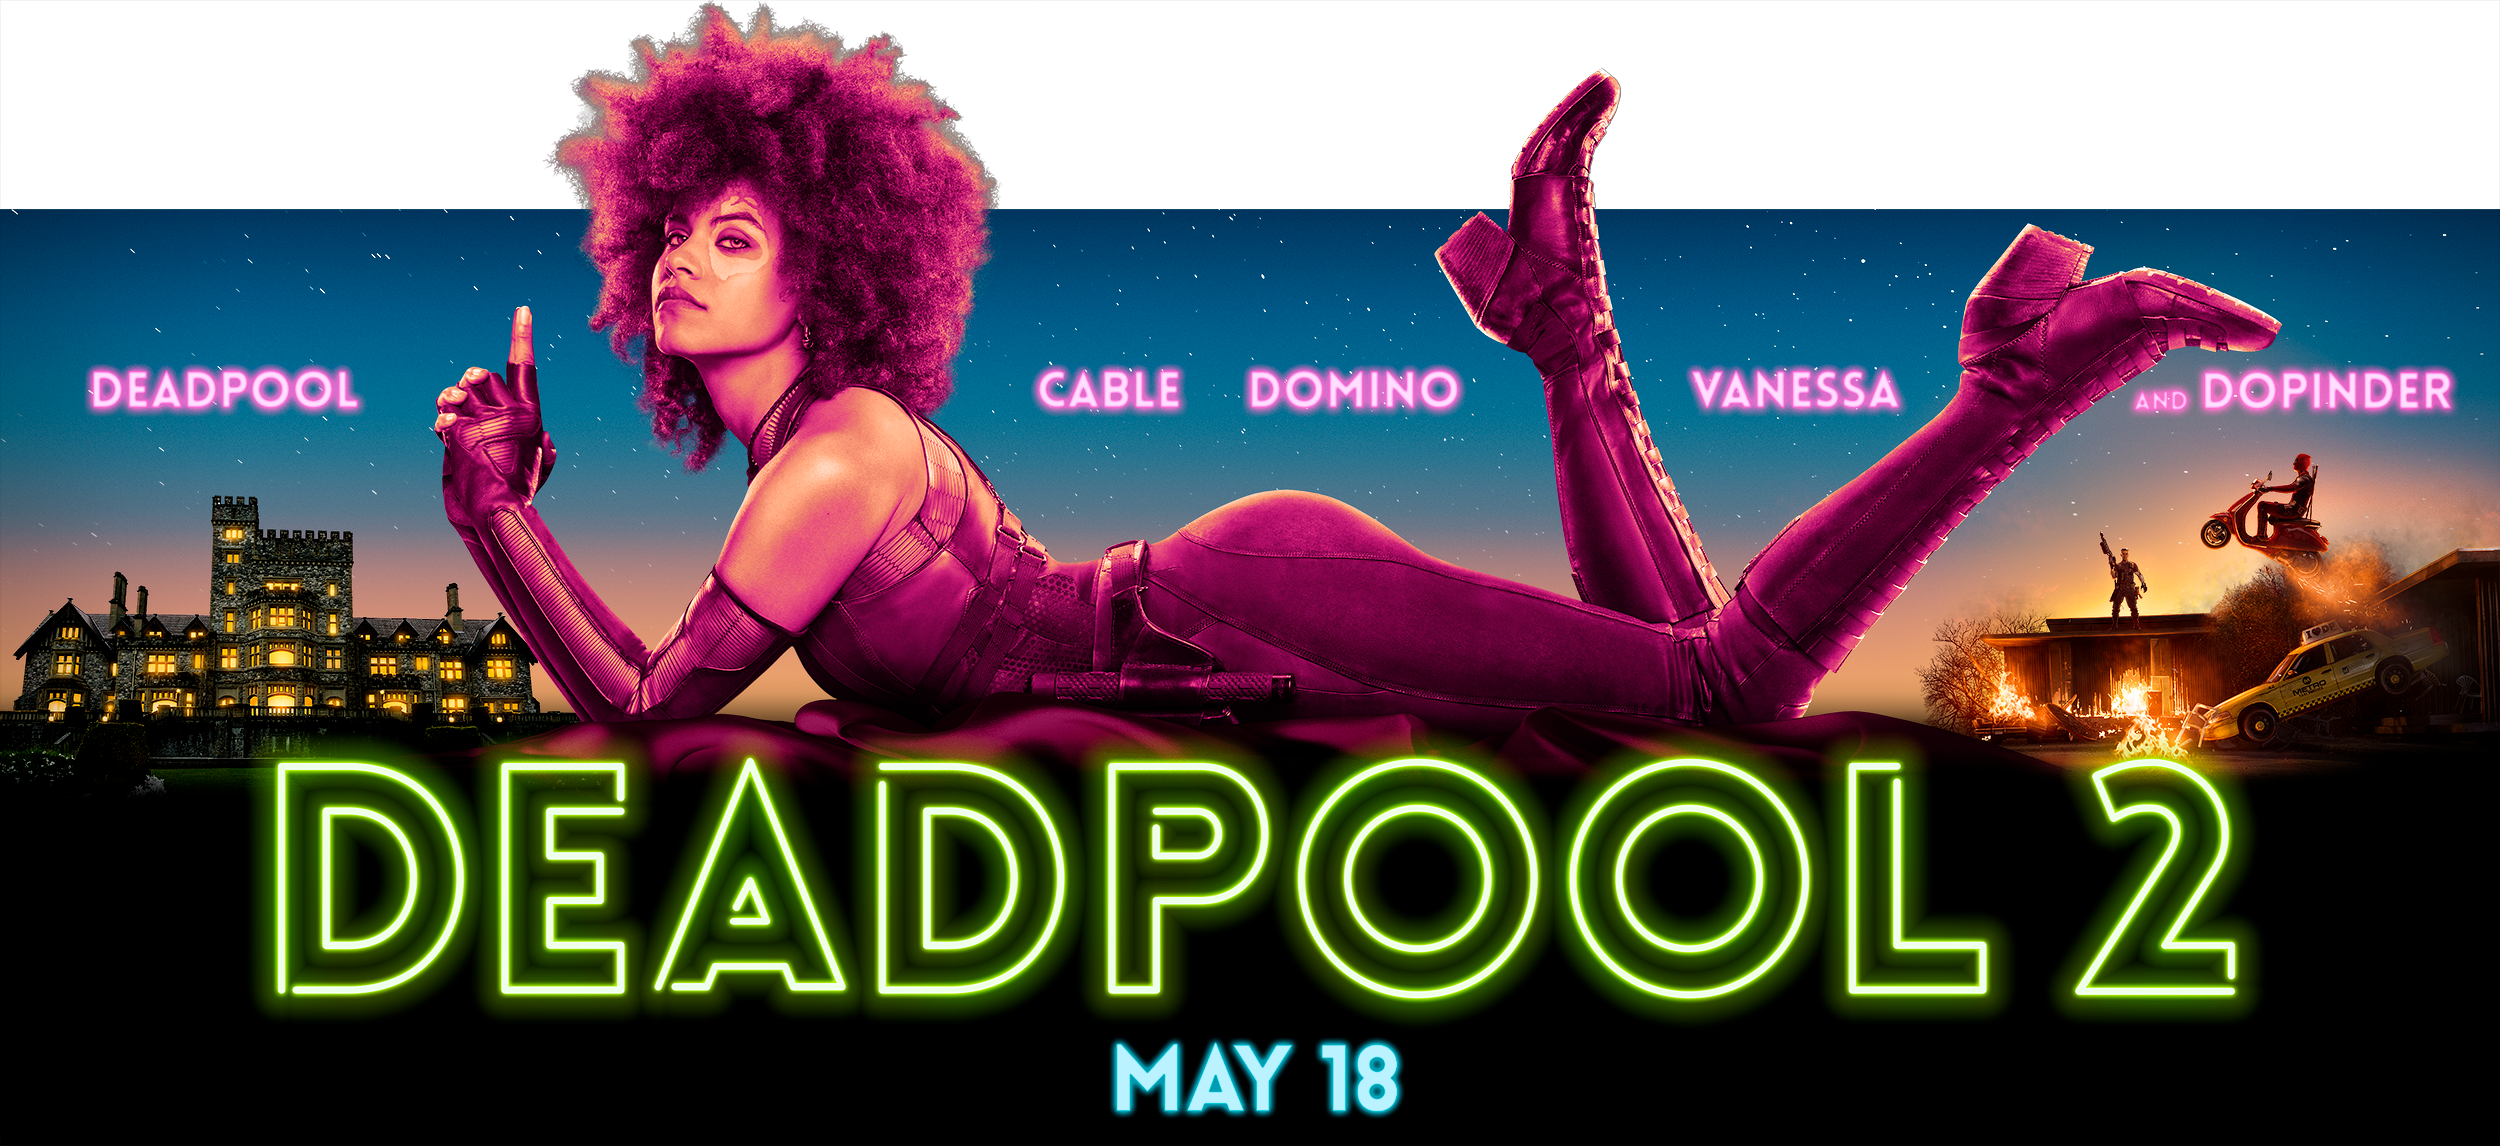 Deadpool 2 | Domino BB Concept, Finishing & Illustration